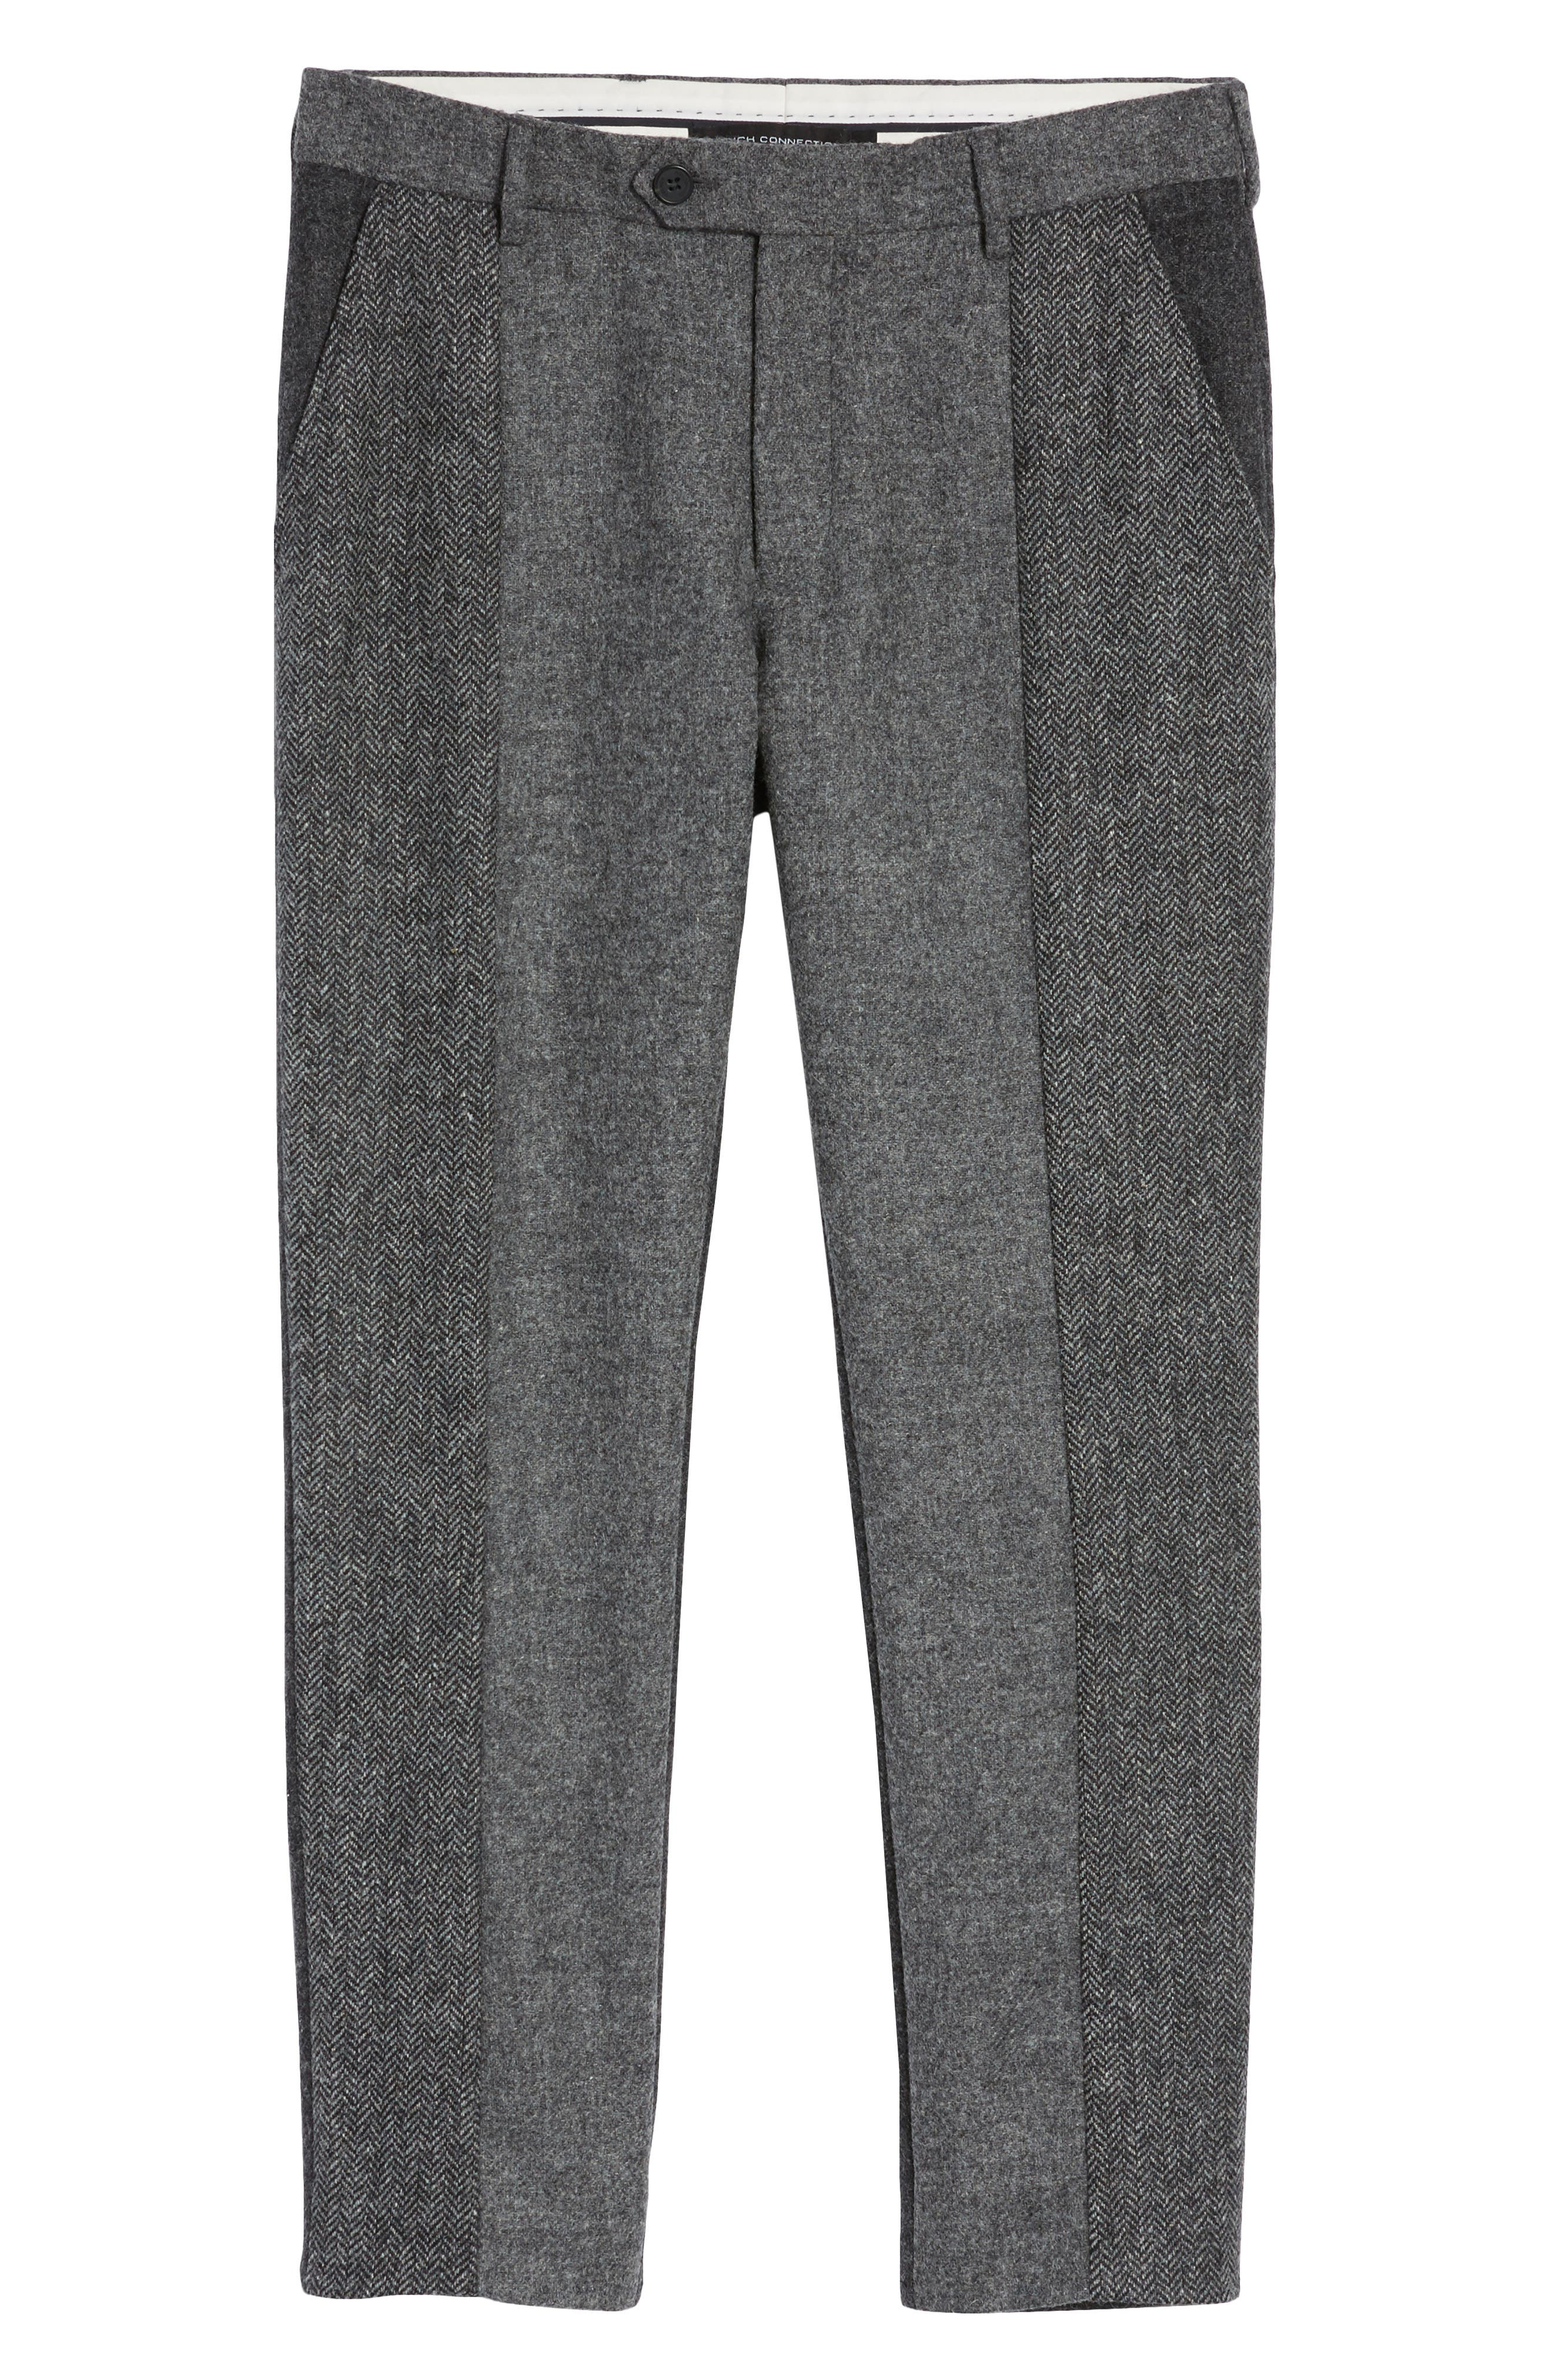 Patchwork Wool Trousers,                             Alternate thumbnail 6, color,                             Grey Melange